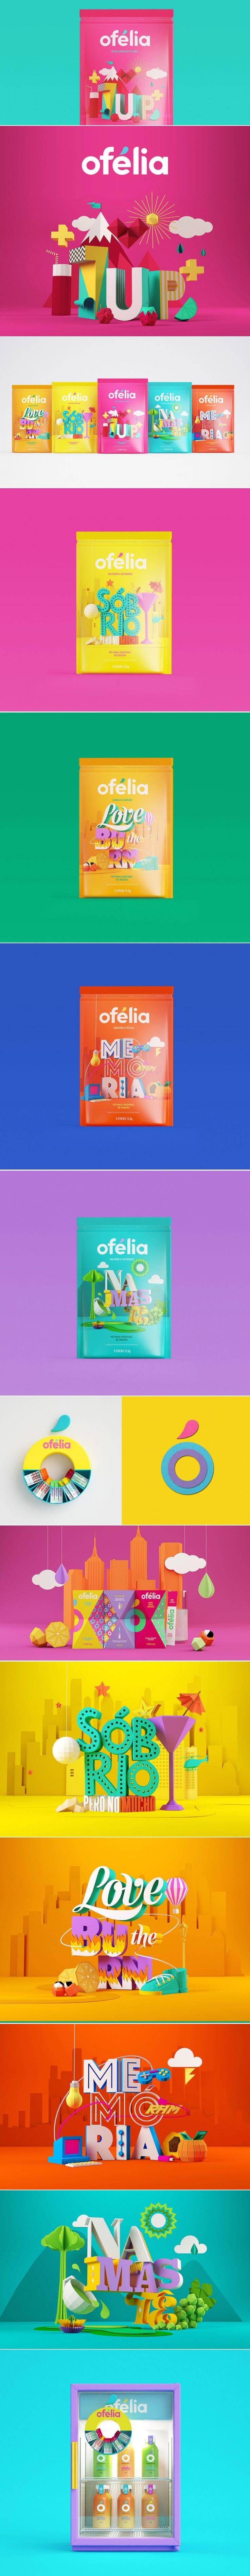 Ofélia — The Dieline - Branding & Packaging Design